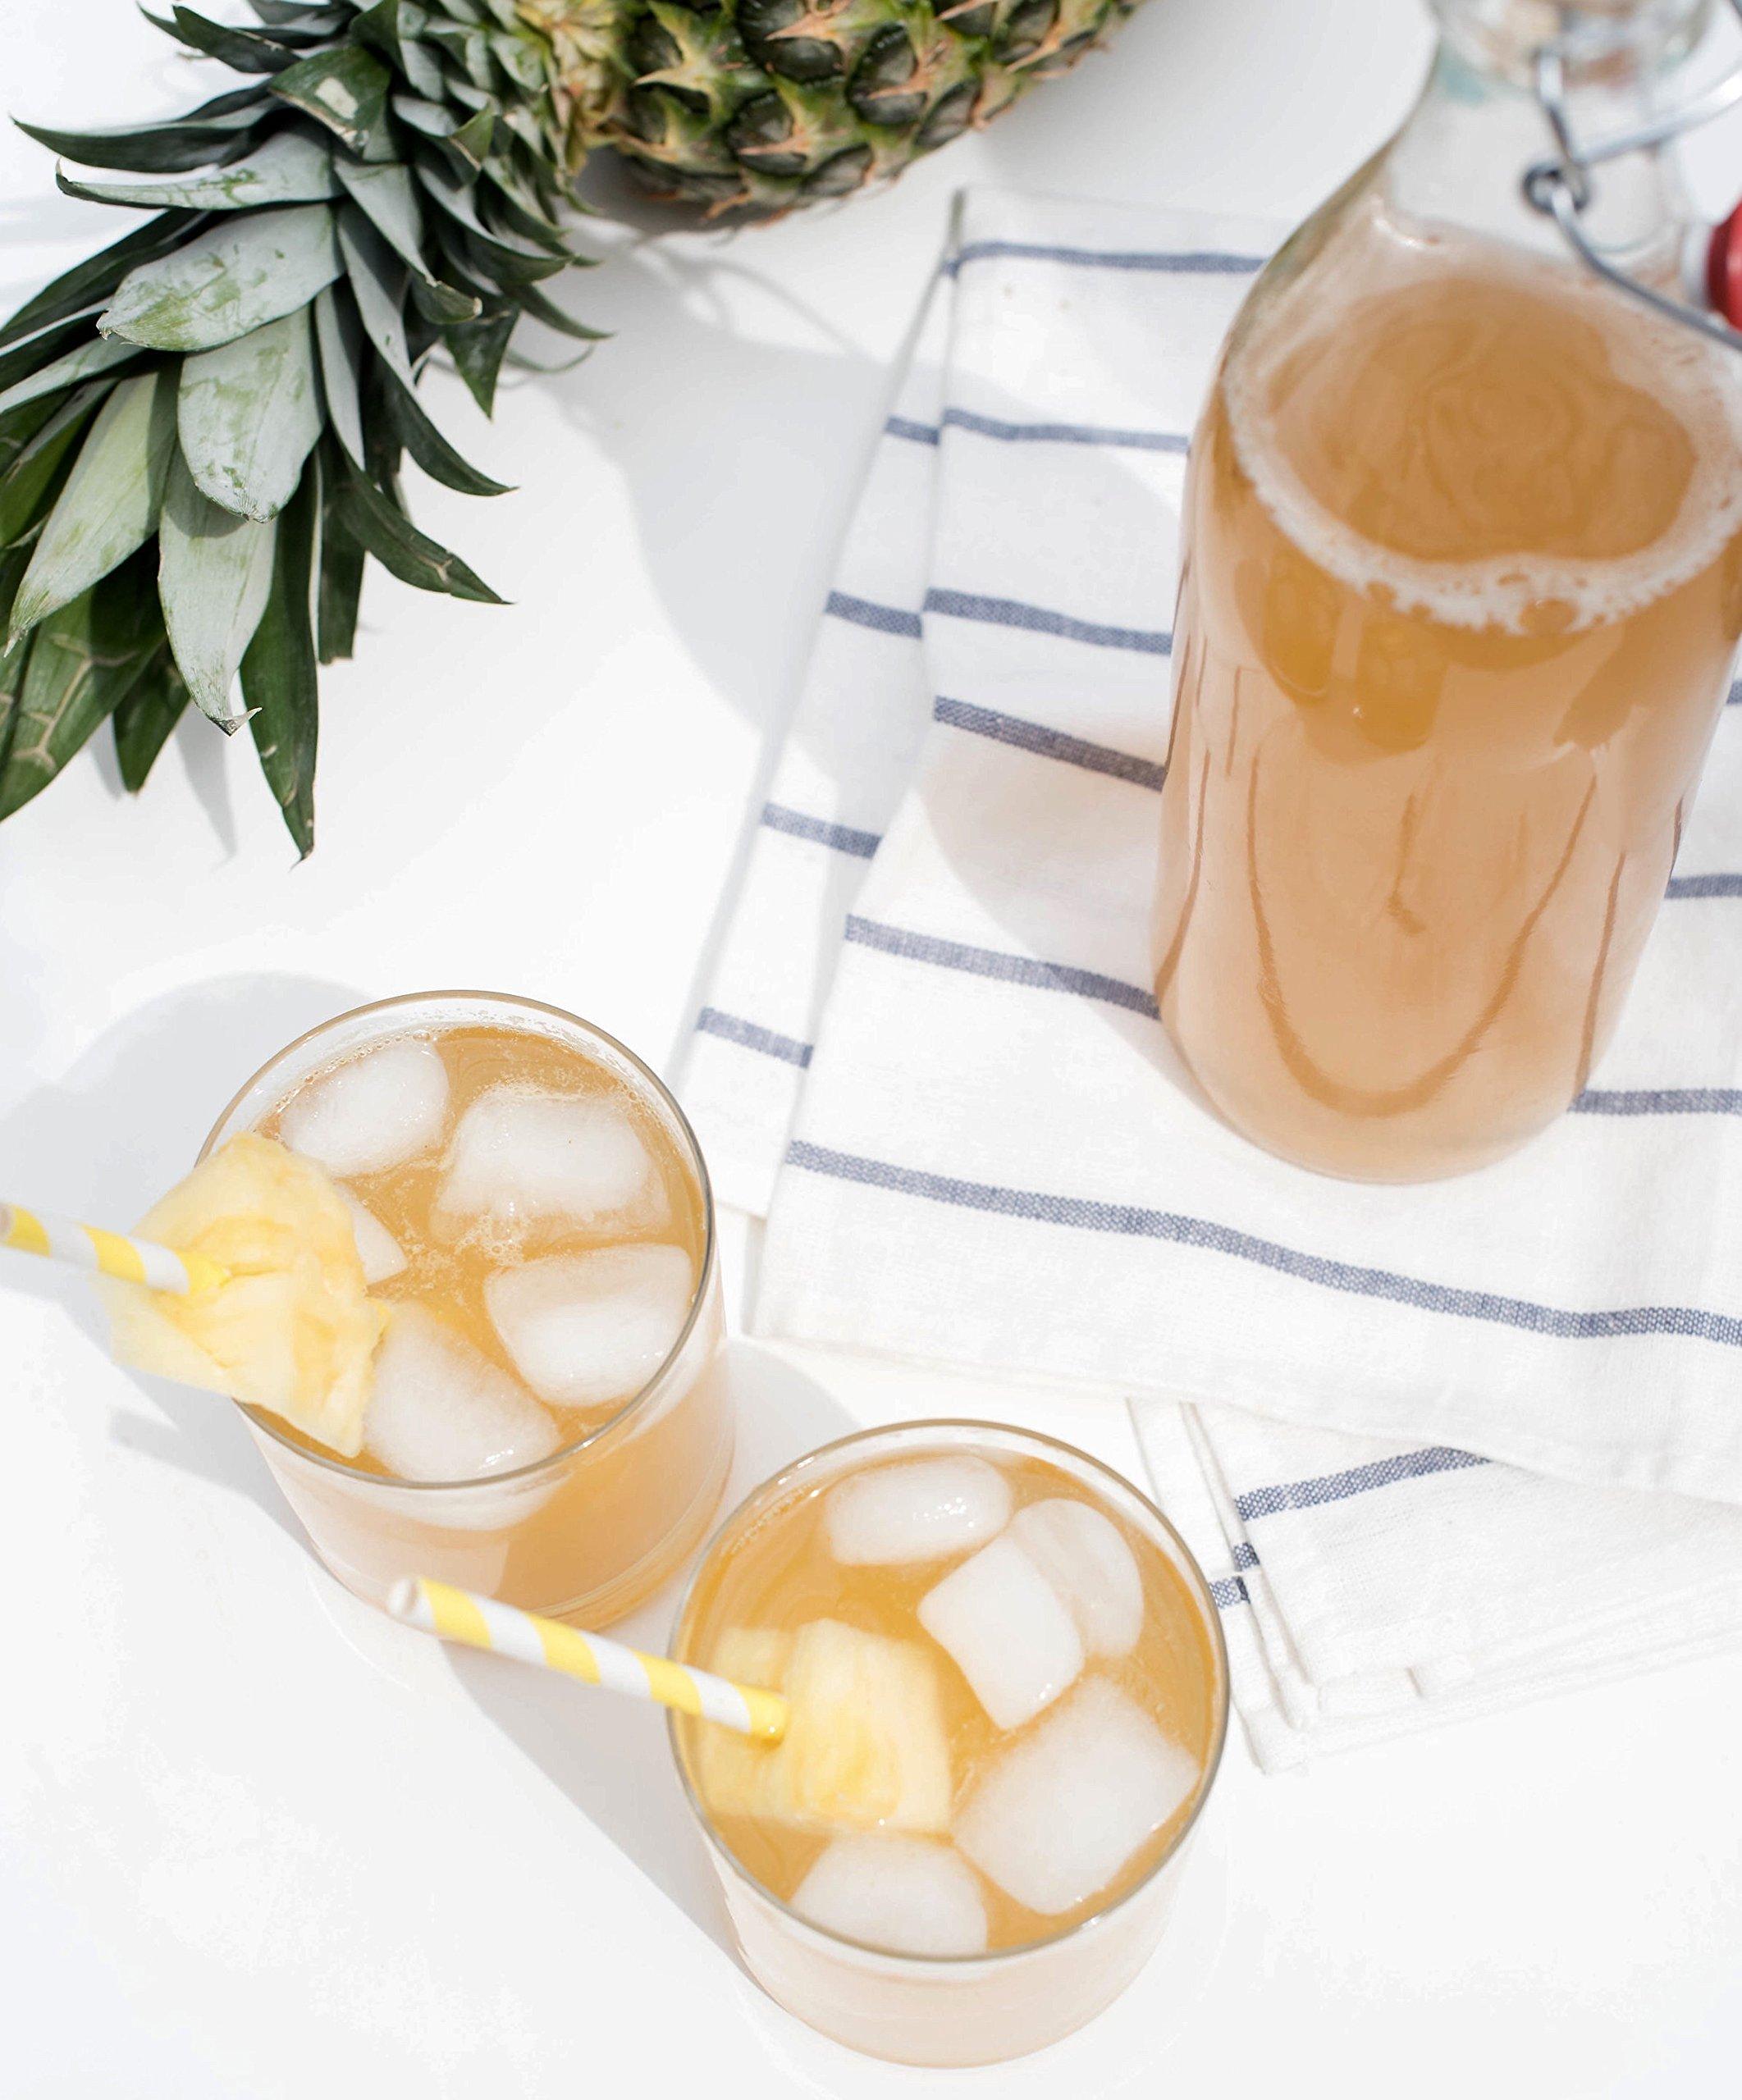 Kombucha Brewing Kit with Organic Kombucha Scoby. Includes Glass Brew Jar, Organic Kombucha Loose Leaf Tea, Temperature Gauge, Organic Sugar and More! by The Kombucha Shop (Image #8)